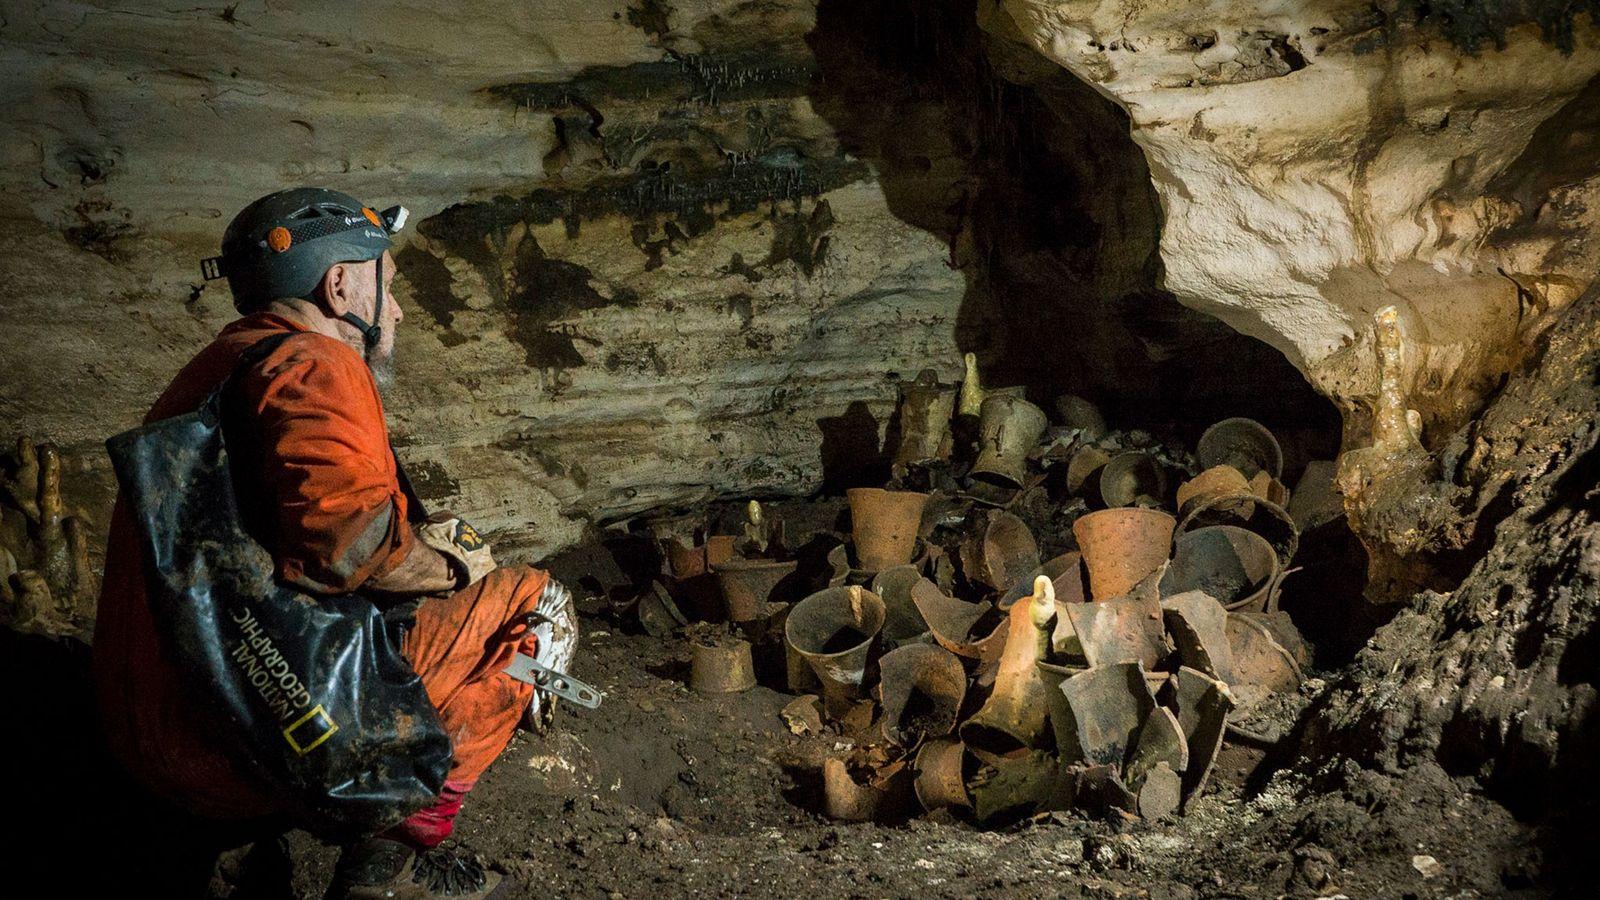 Guillermo de Anda, explorador da National Geographic, examina uma área de vasos de rituais dentro da ...